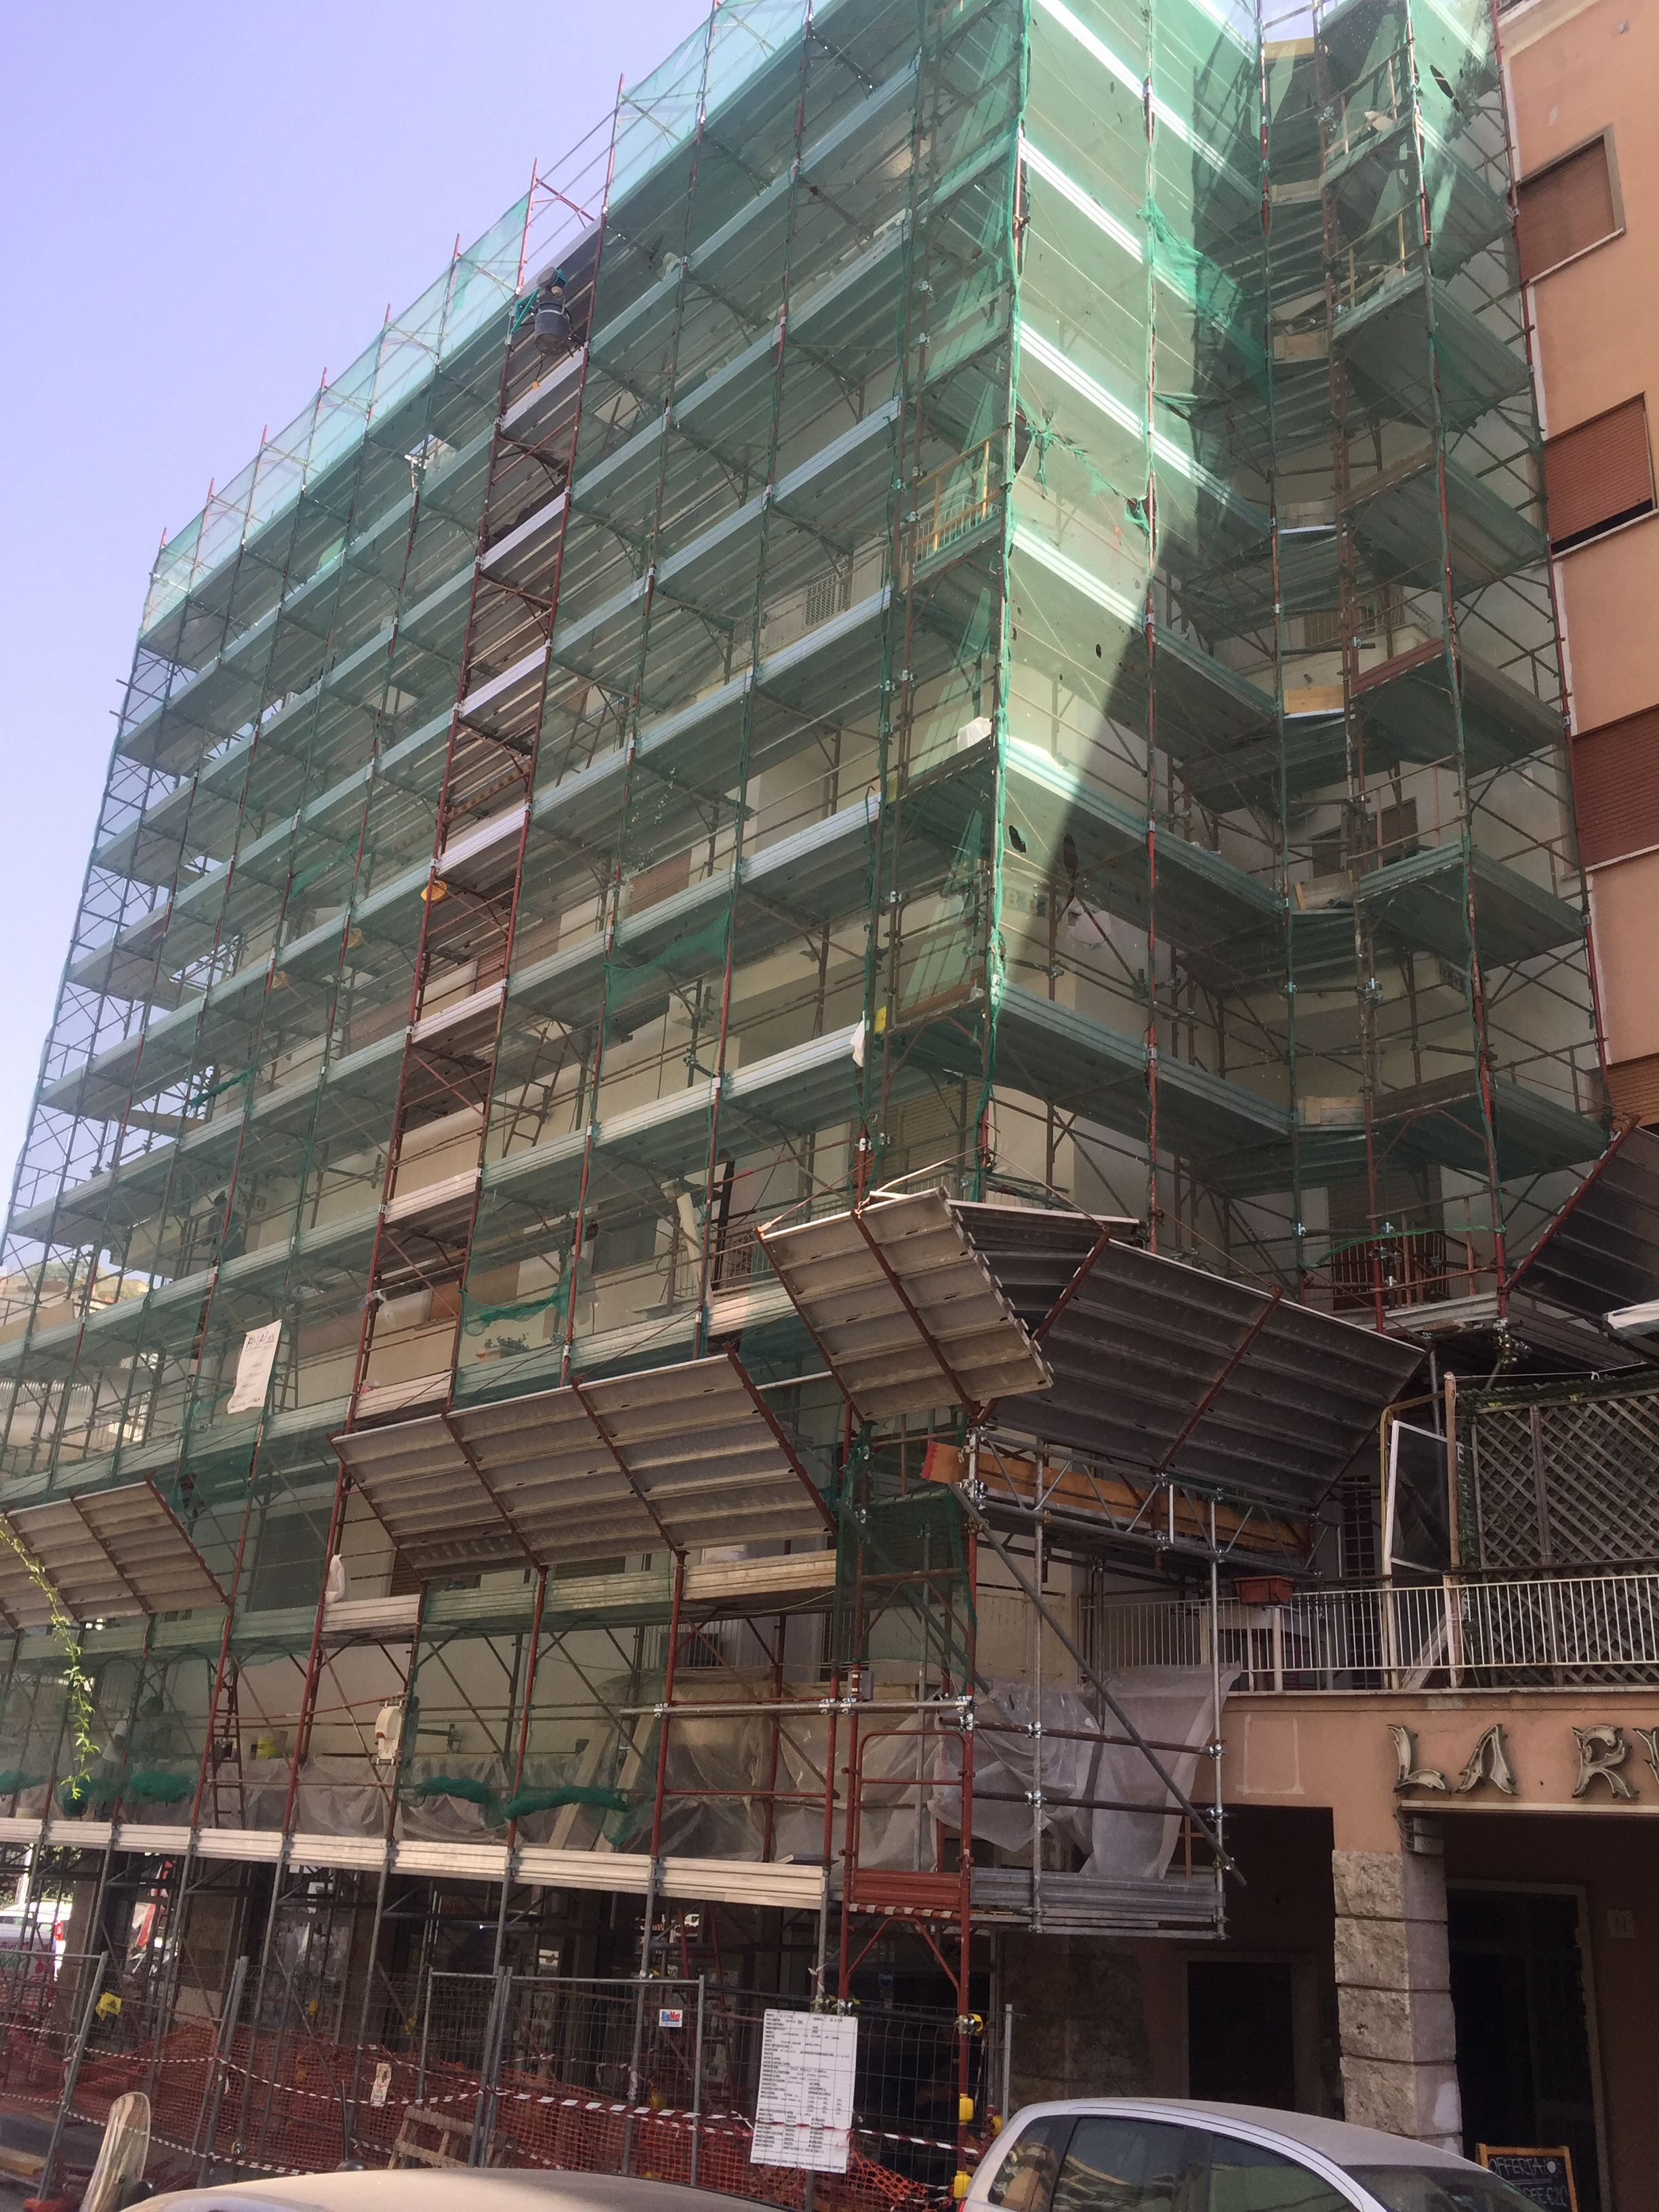 Fimar - Condominio Via Altieri, 11